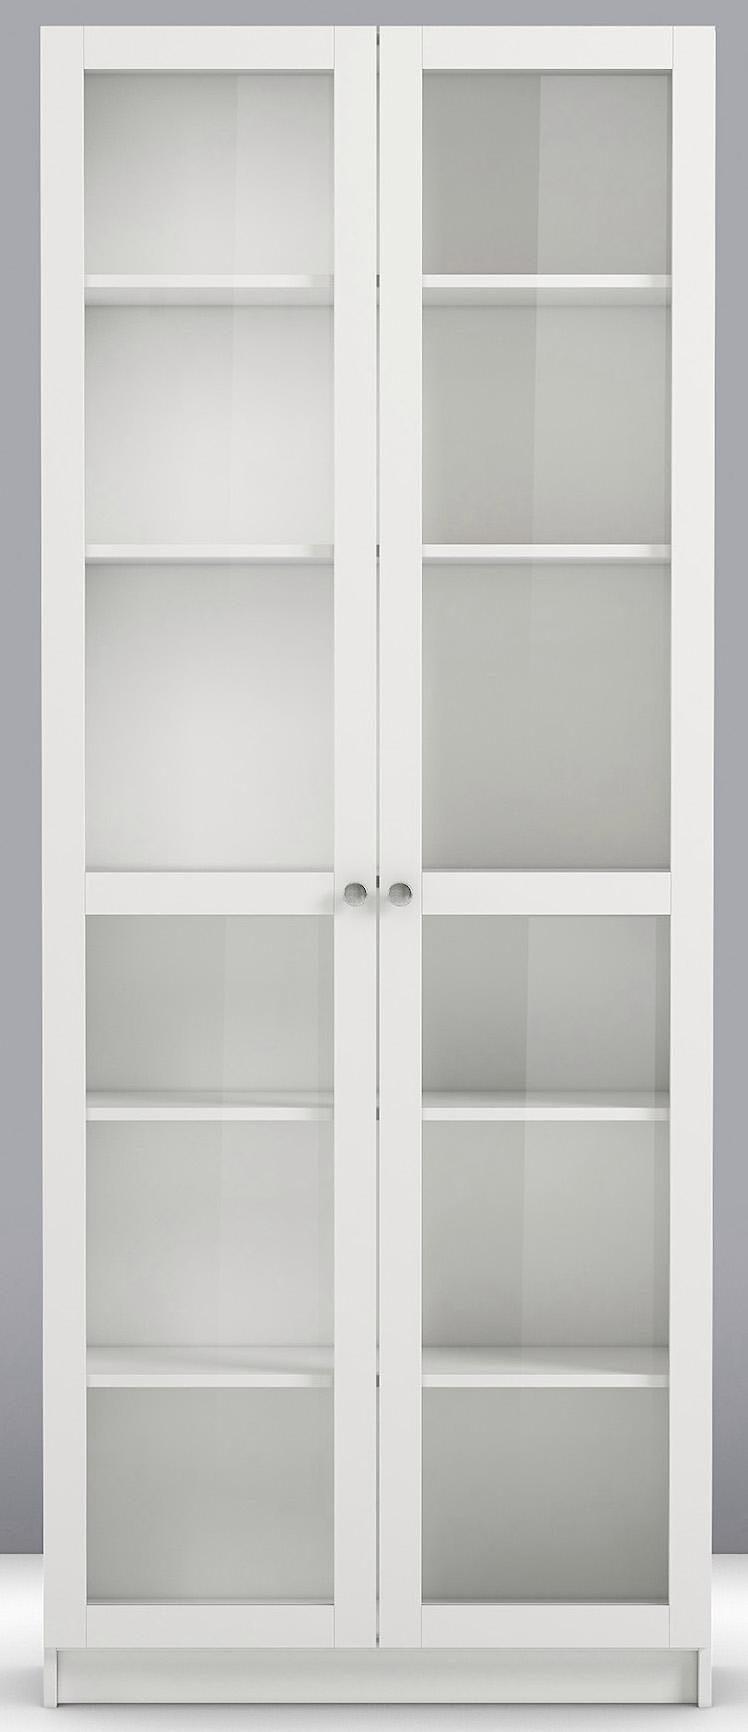 Home affaire Glastüren-Set »Anette«, Breite 80 cm.